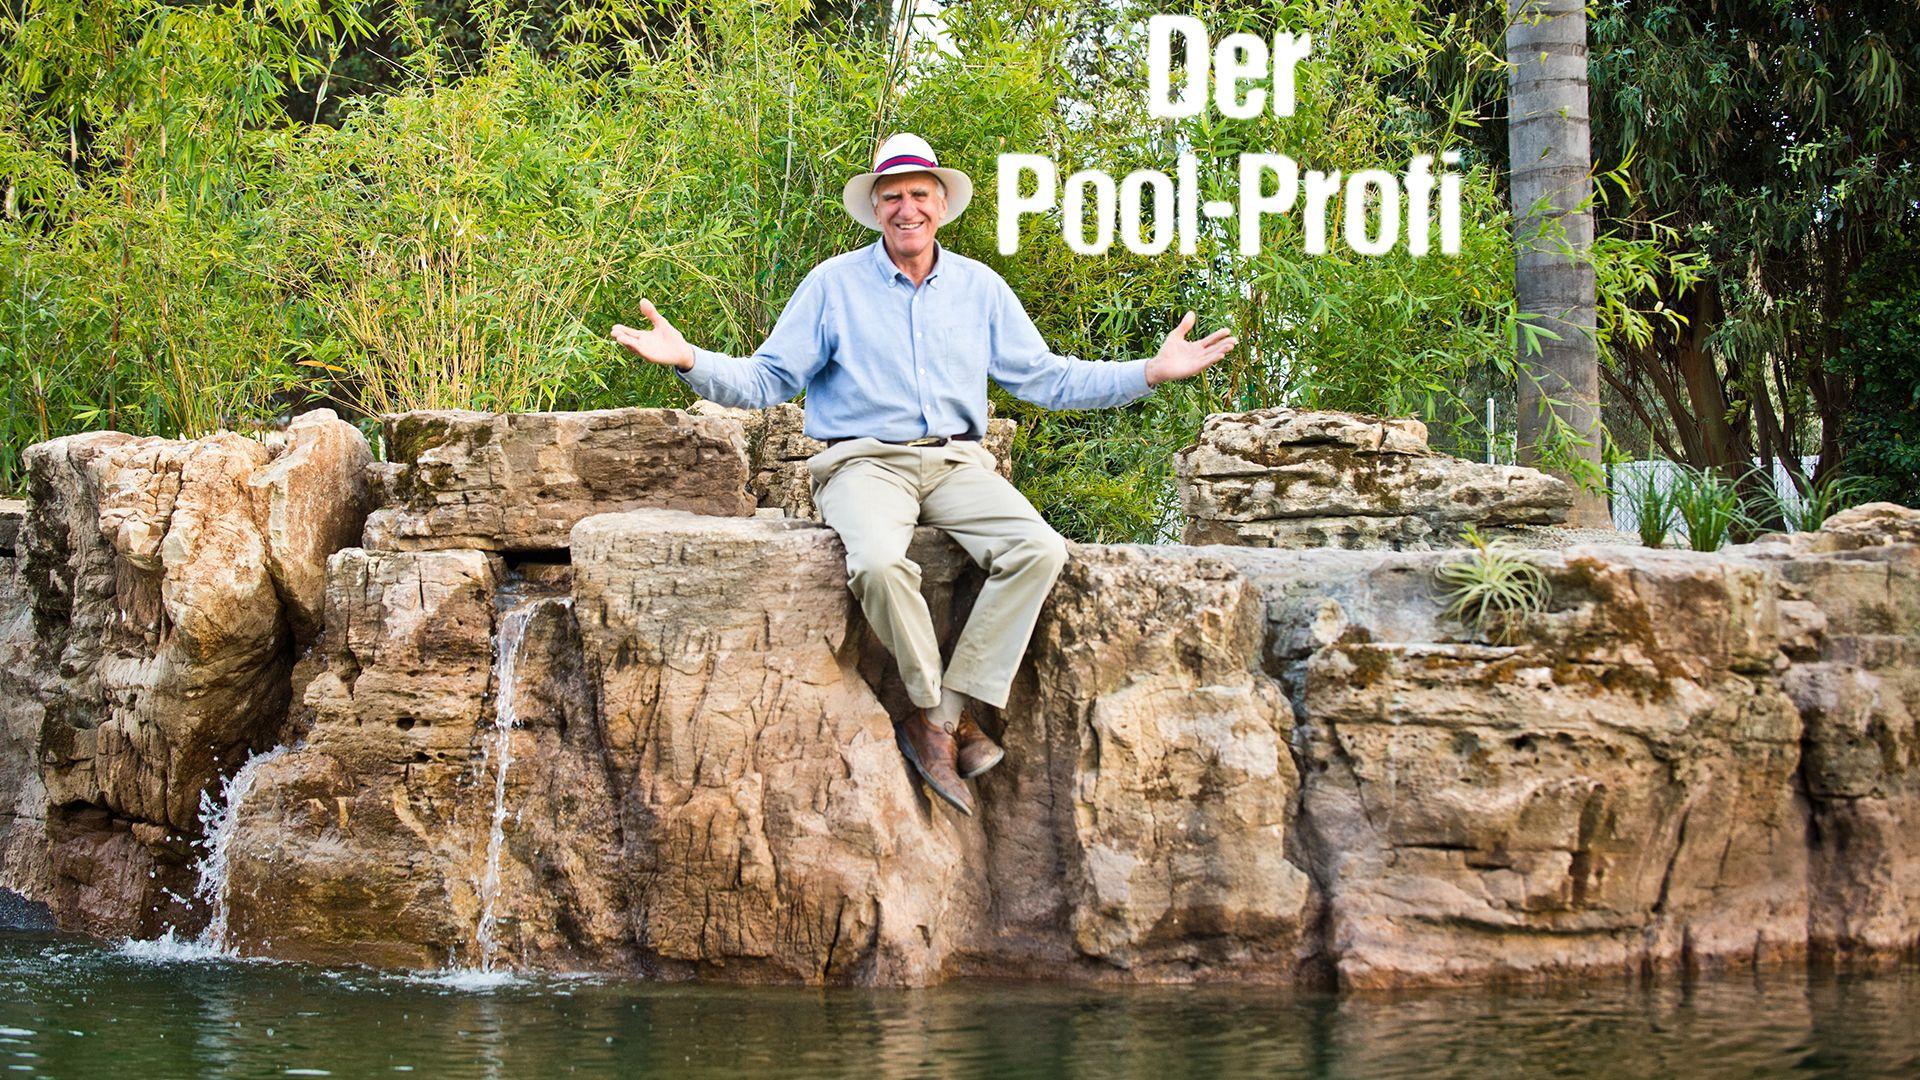 Pool Profi